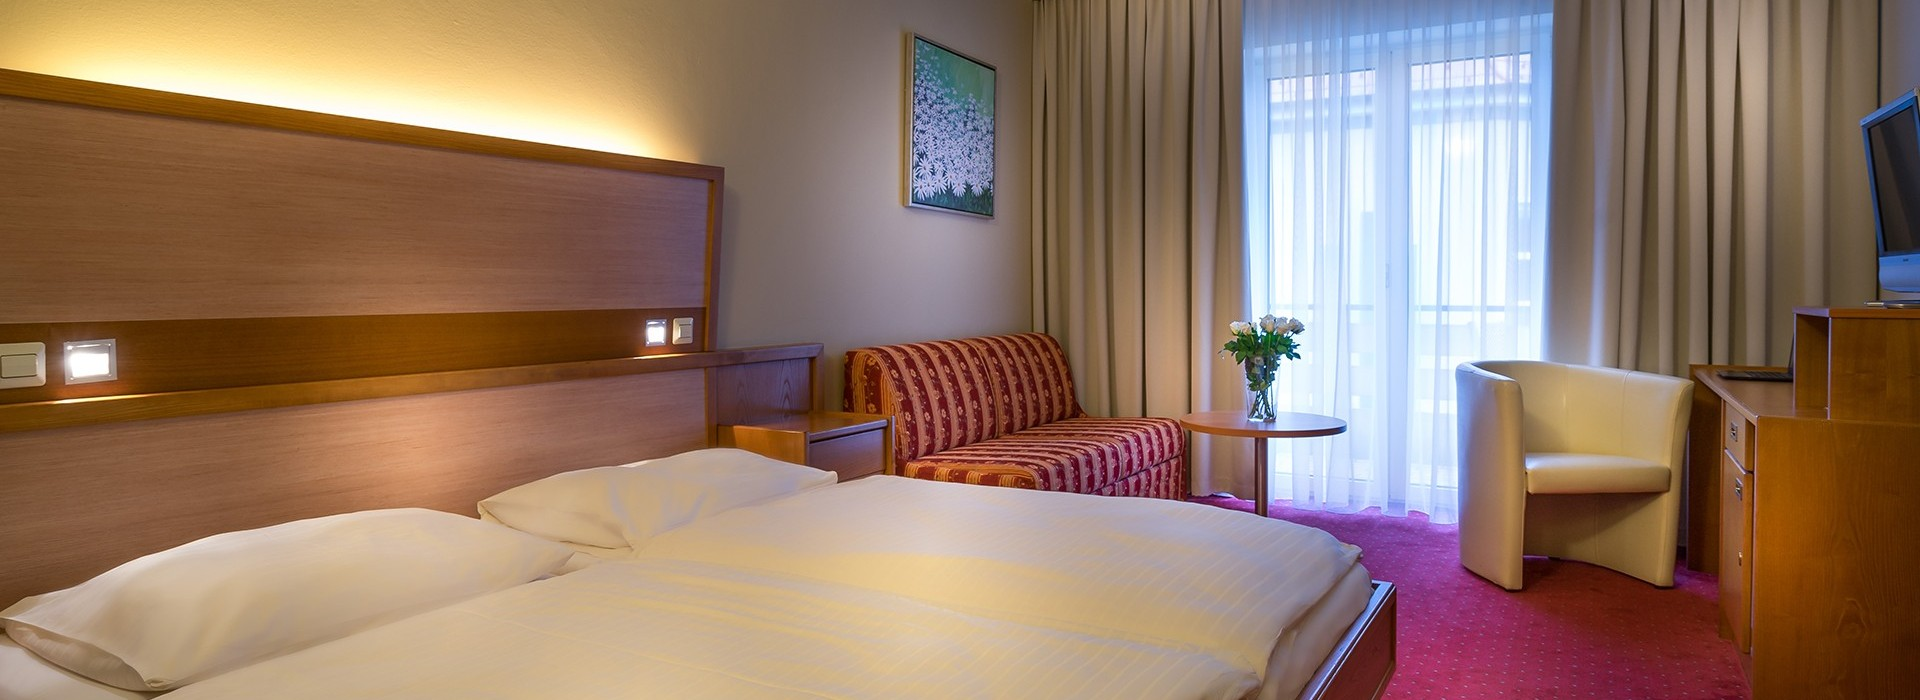 City-Hotel GmbH